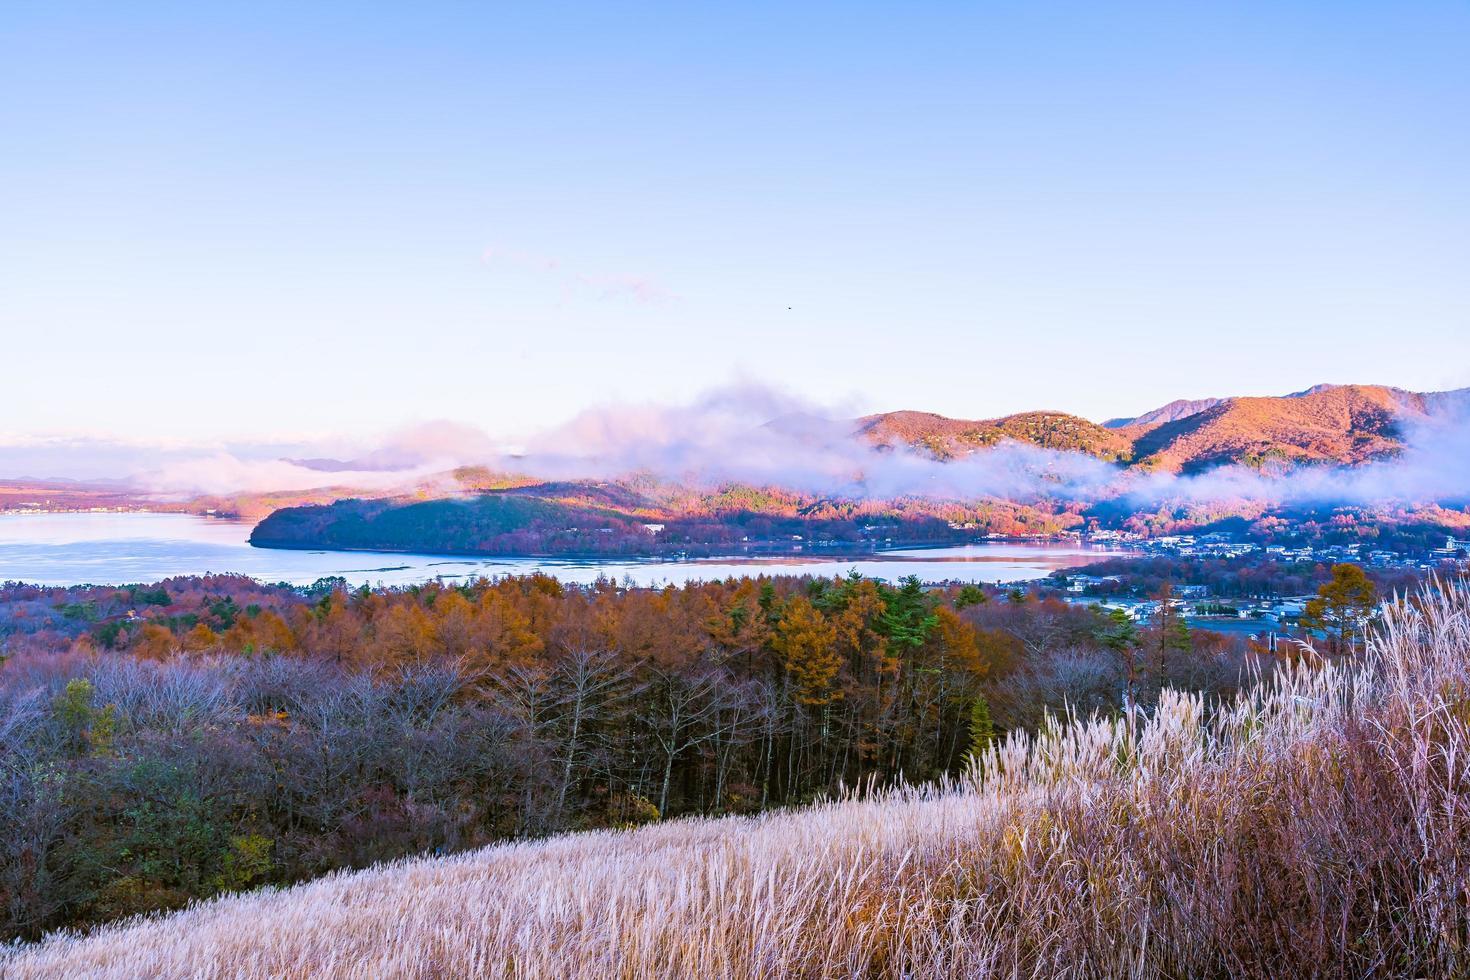 vackert landskap vid sjön yamanakako, japan foto